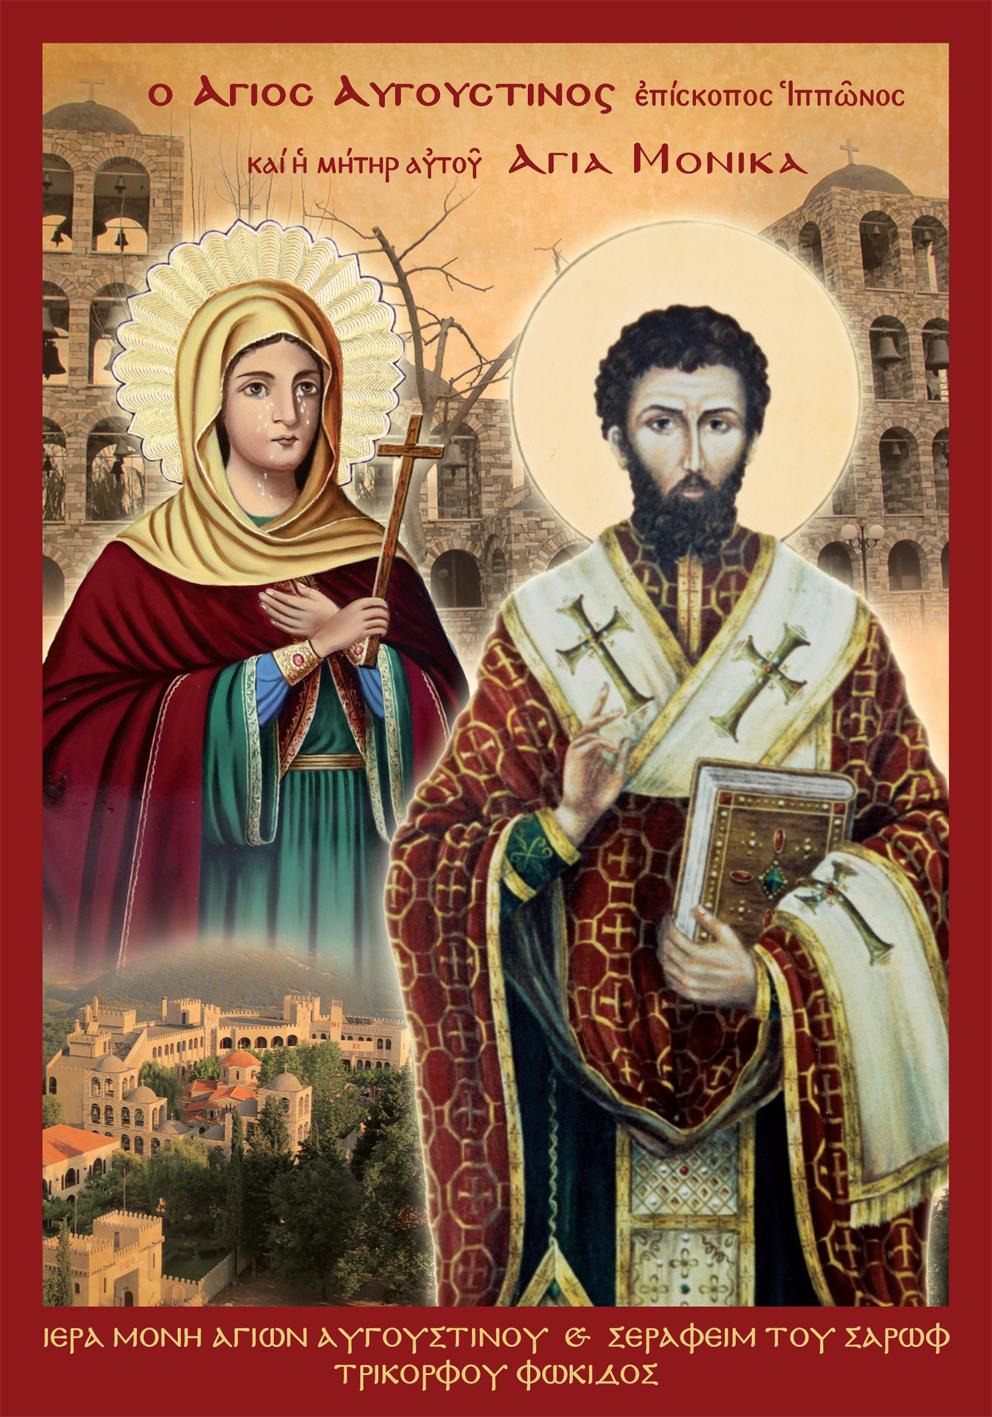 saint-augustine-ipponos-saint-monika-copy.jpg